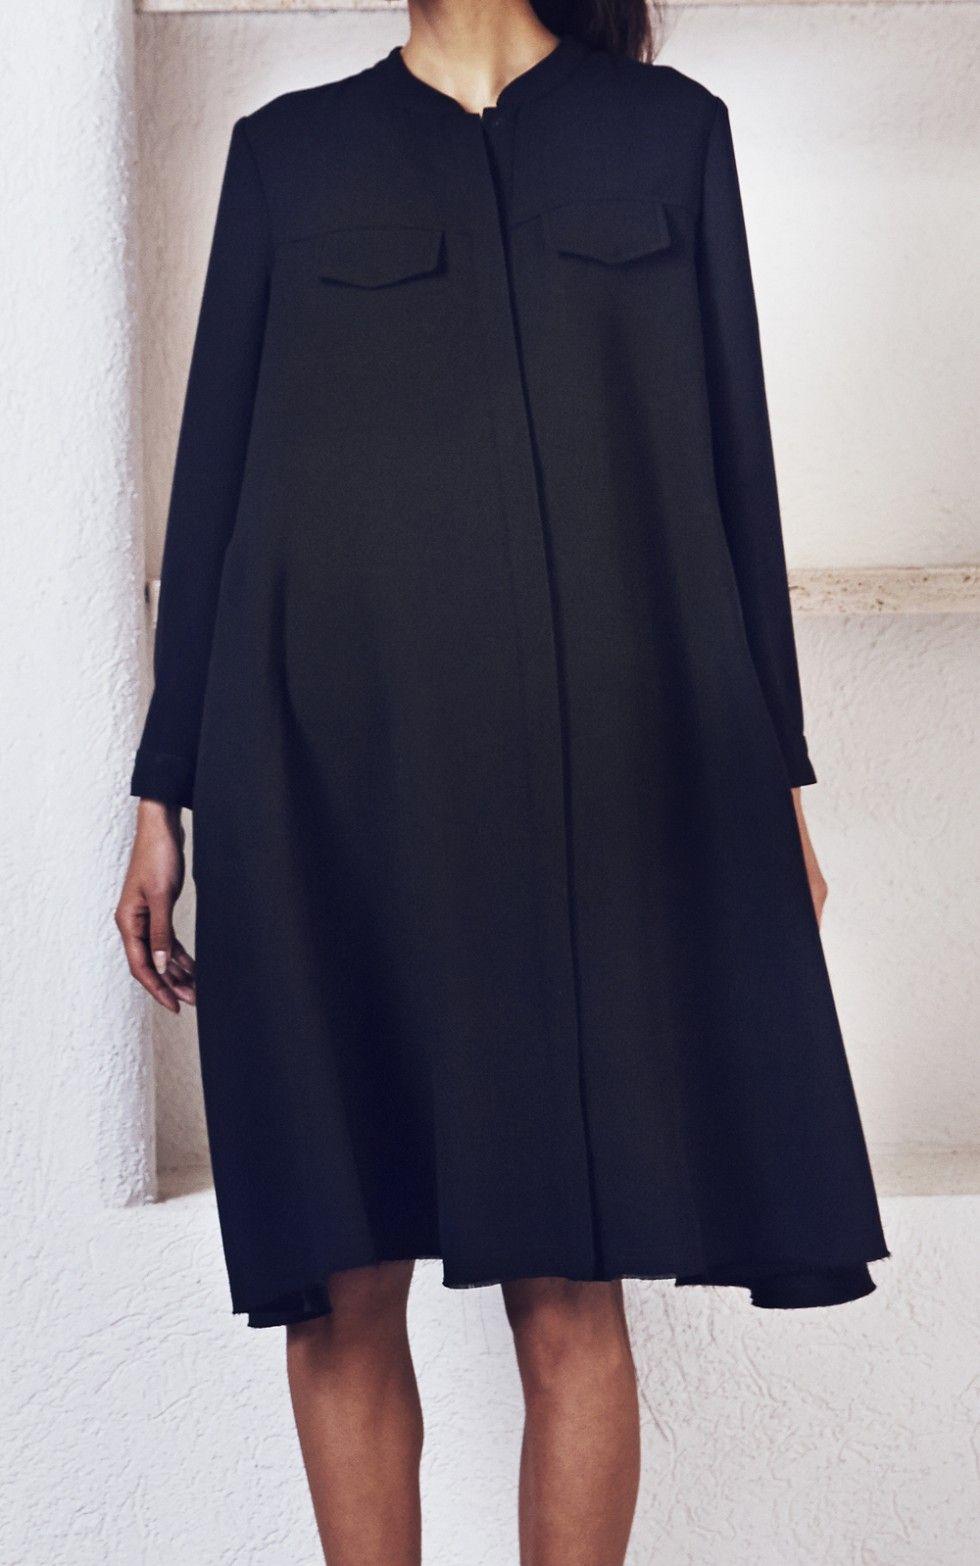 Rachel comey oversized shirt dress style fashion black is